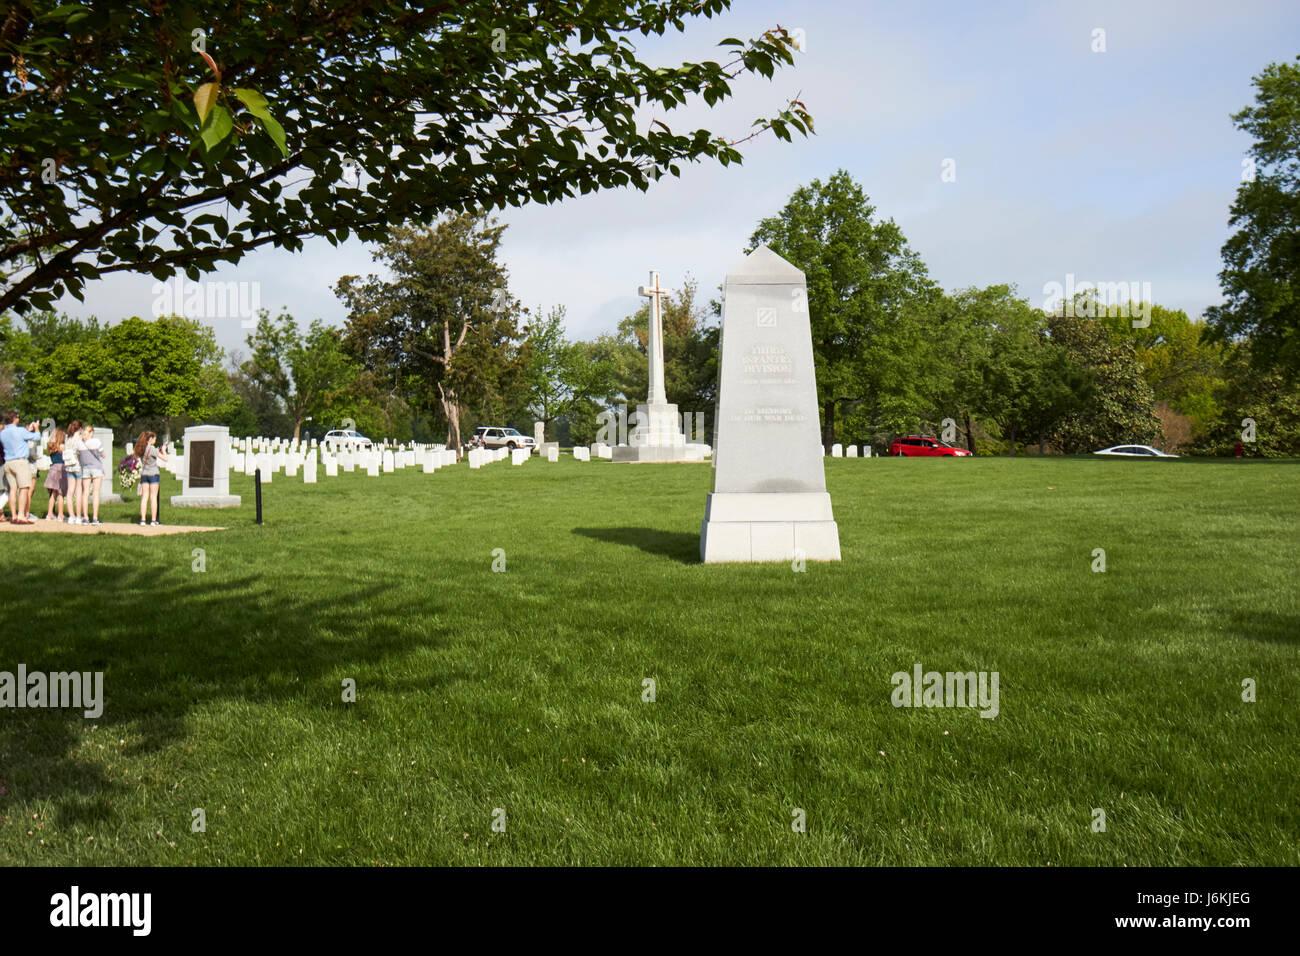 third infantry division memorial arlington cemetery Washington DC USA - Stock Image